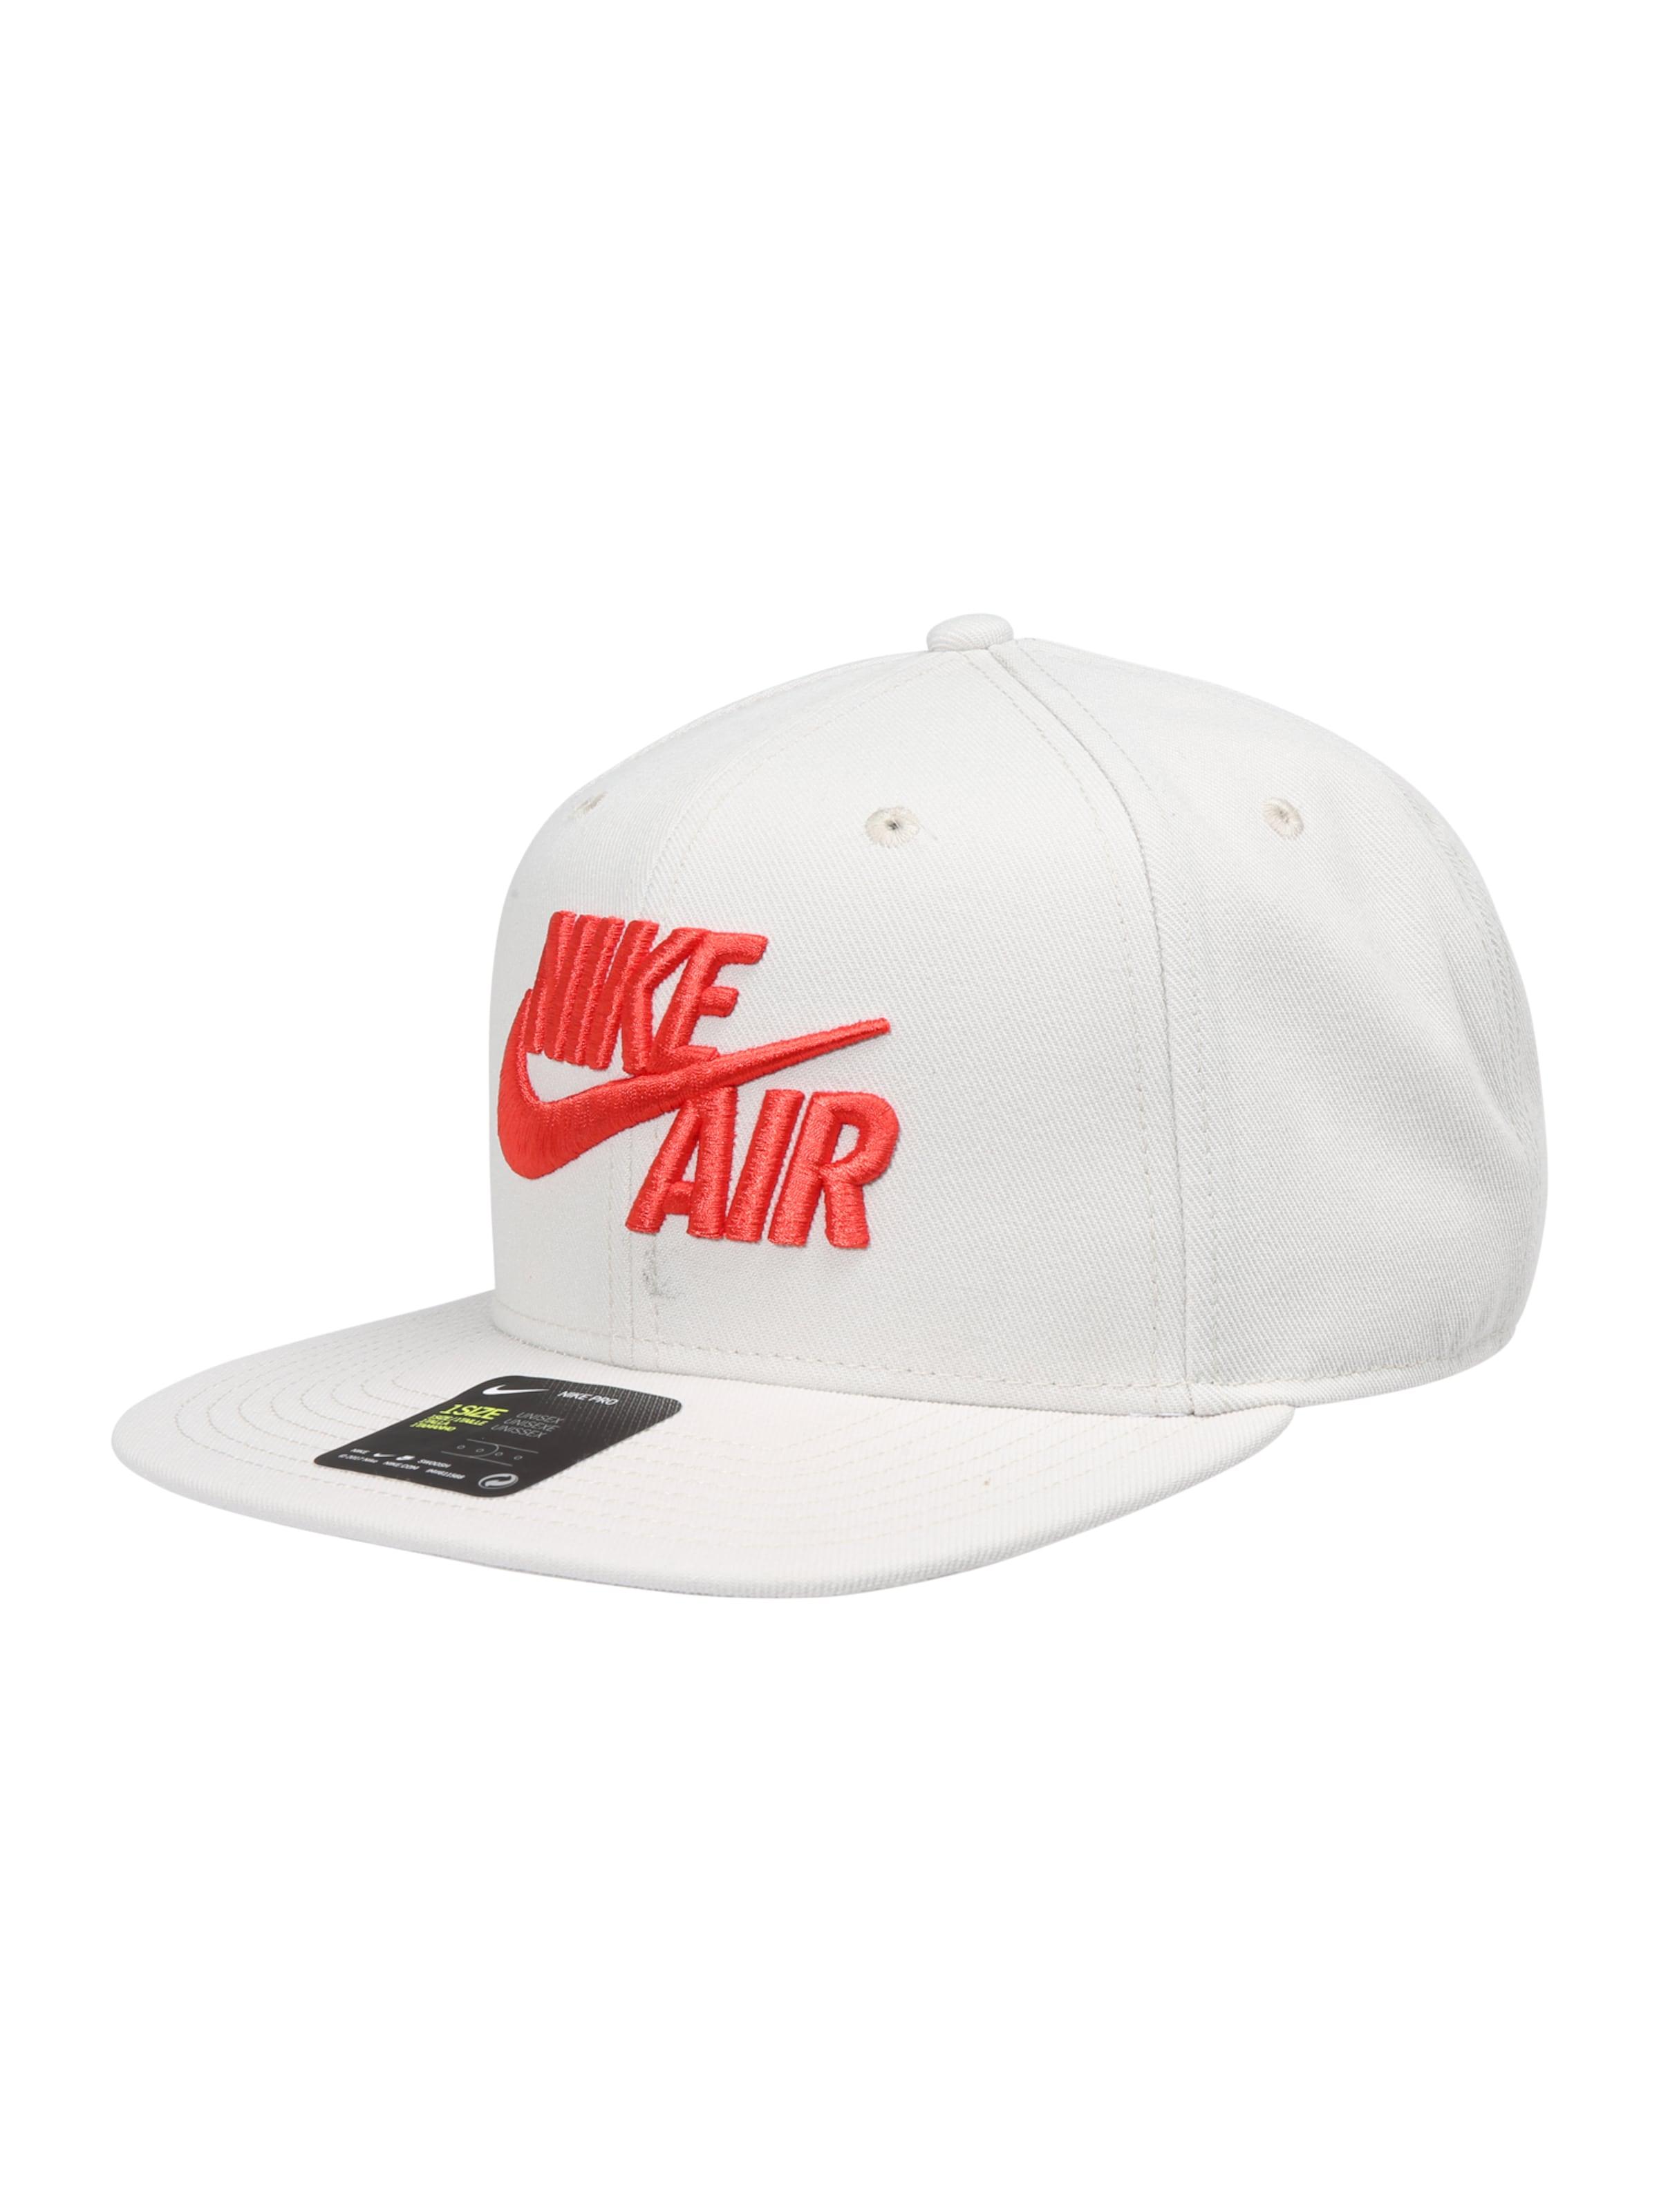 LichtroodWit Classic' Nike Sportswear Pet In 'air QrCWdoexB